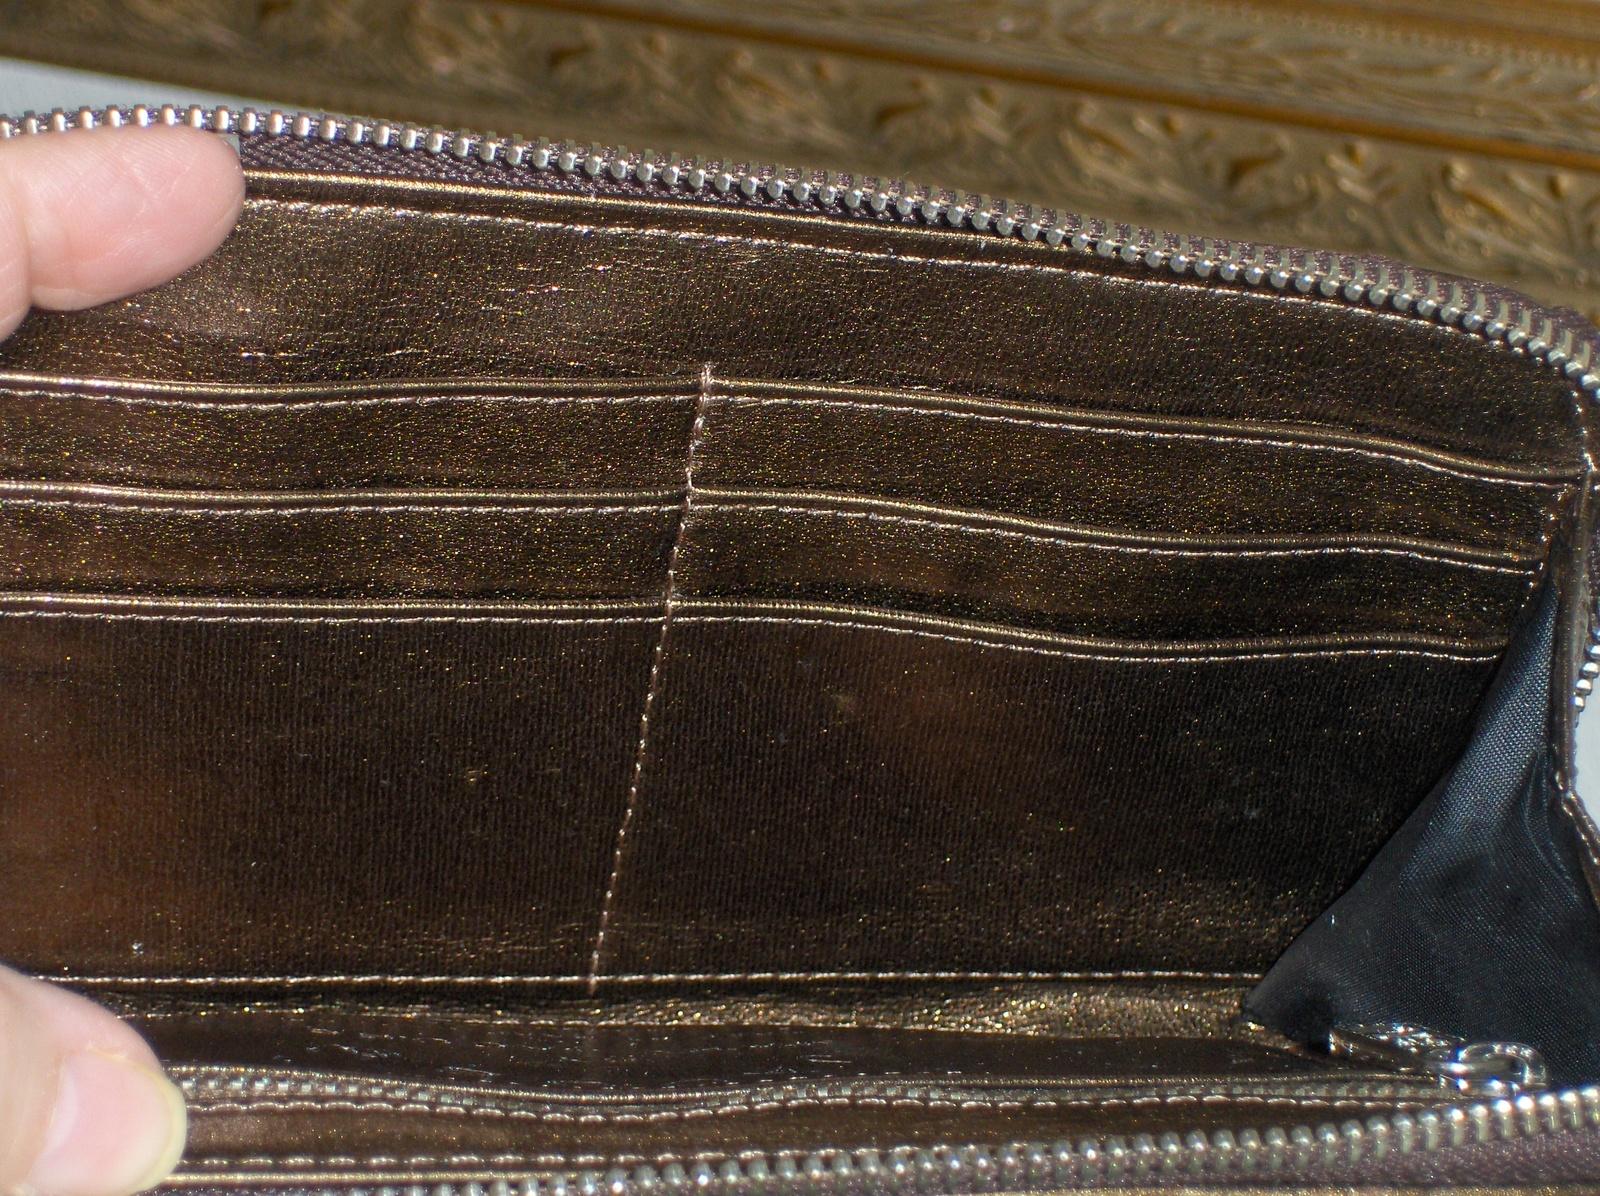 Marc Jacobs Womens Clutch Wallet Quilted Satin Brown Zip Around Wristlet Purse